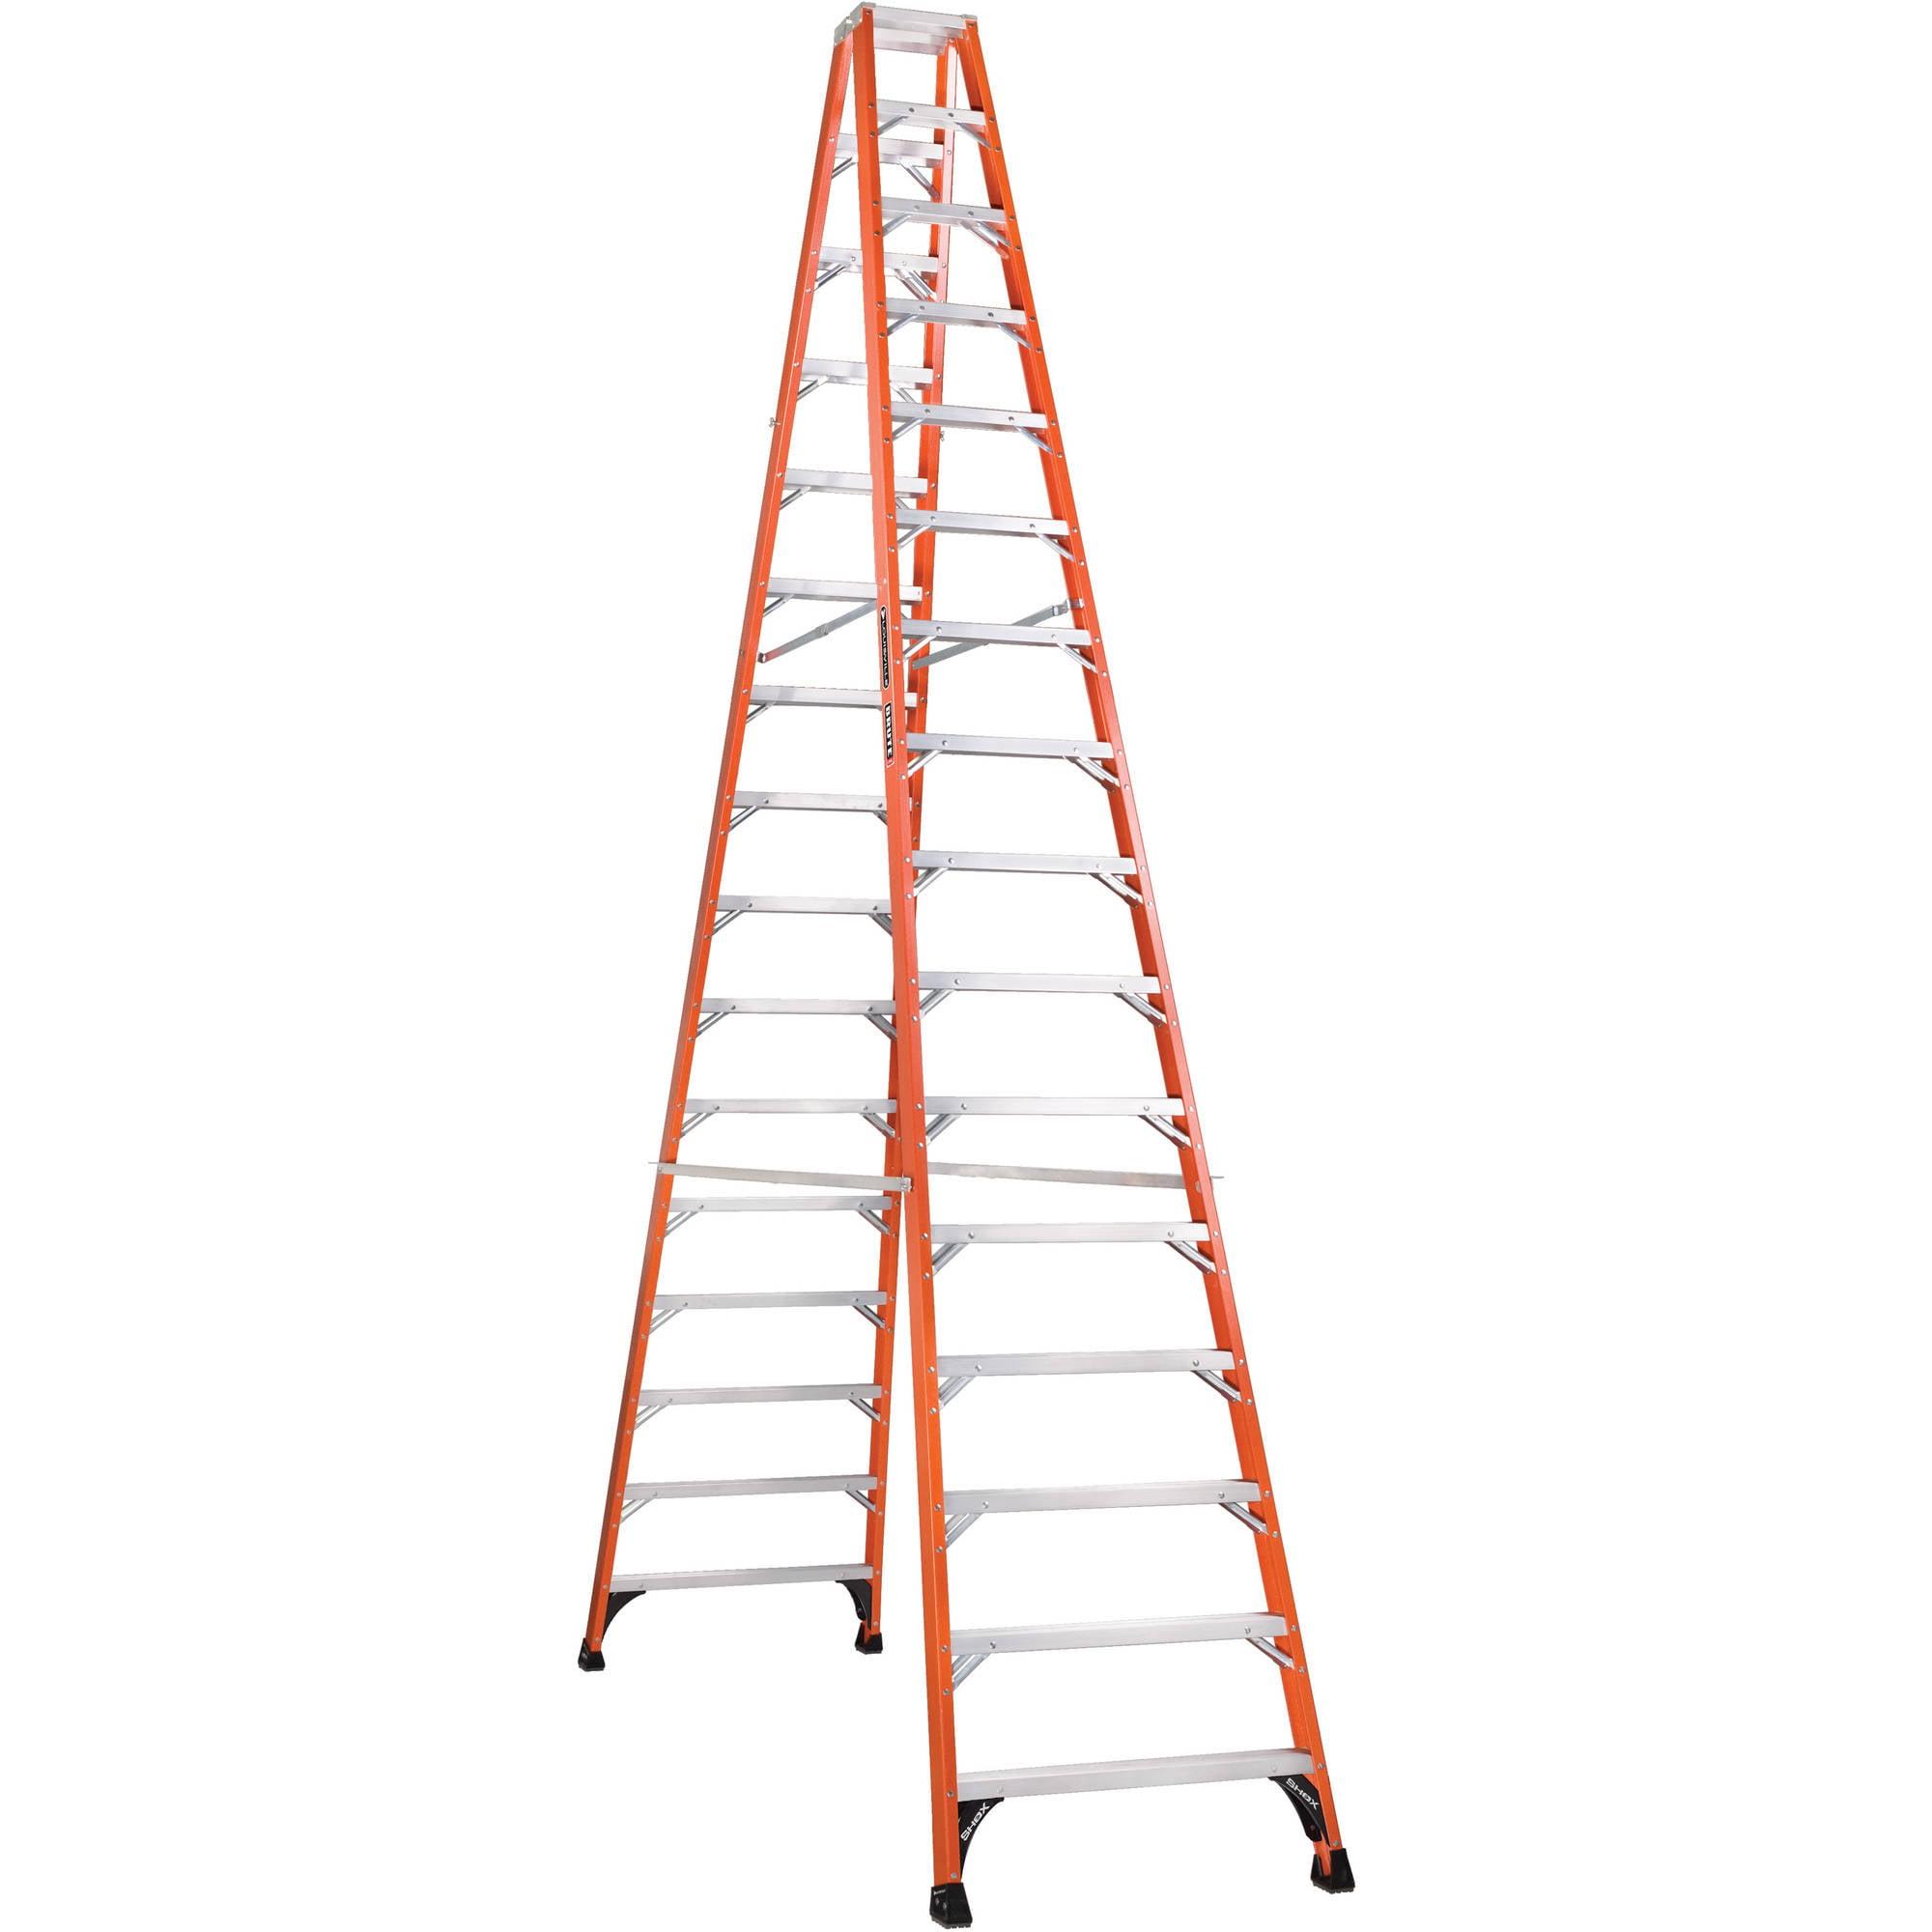 Louisville Ladder FM1416HD 16 ft. Fiberglass Twin Step Ladder, Type IAA, 375 Lbs Load Capacity